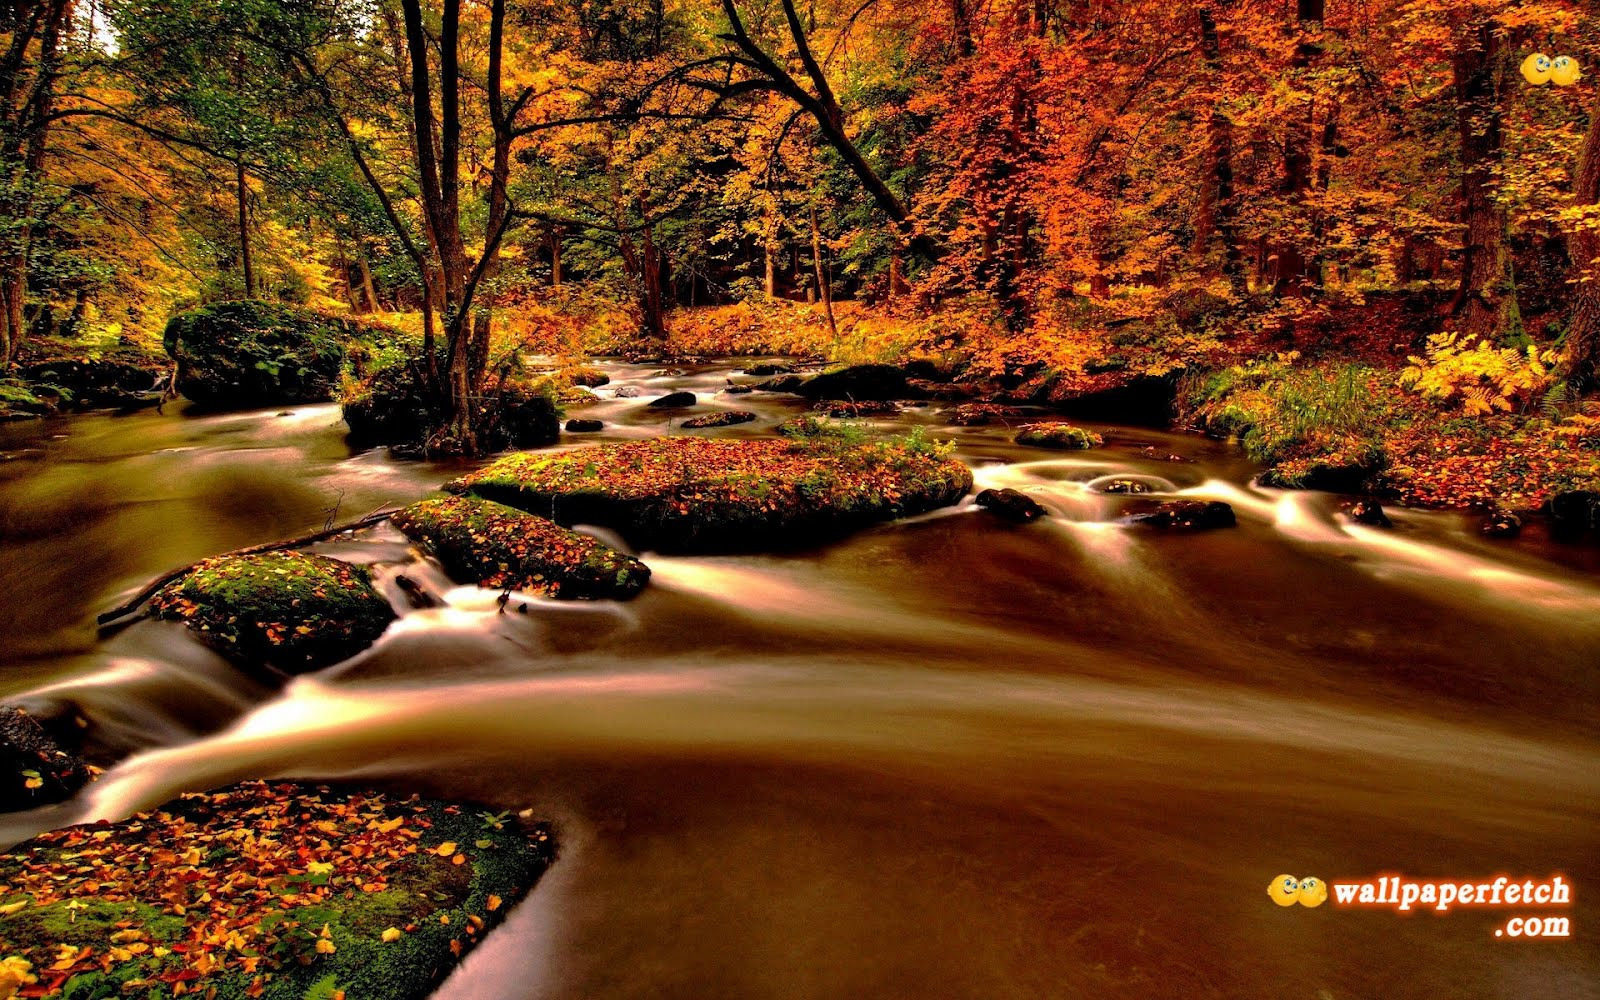 http://4.bp.blogspot.com/-1gB90x-EWmo/UC6lYA0nKZI/AAAAAAAANl4/qcmJTOhuaTc/s1600/smooth-river-flow-96648.jpg